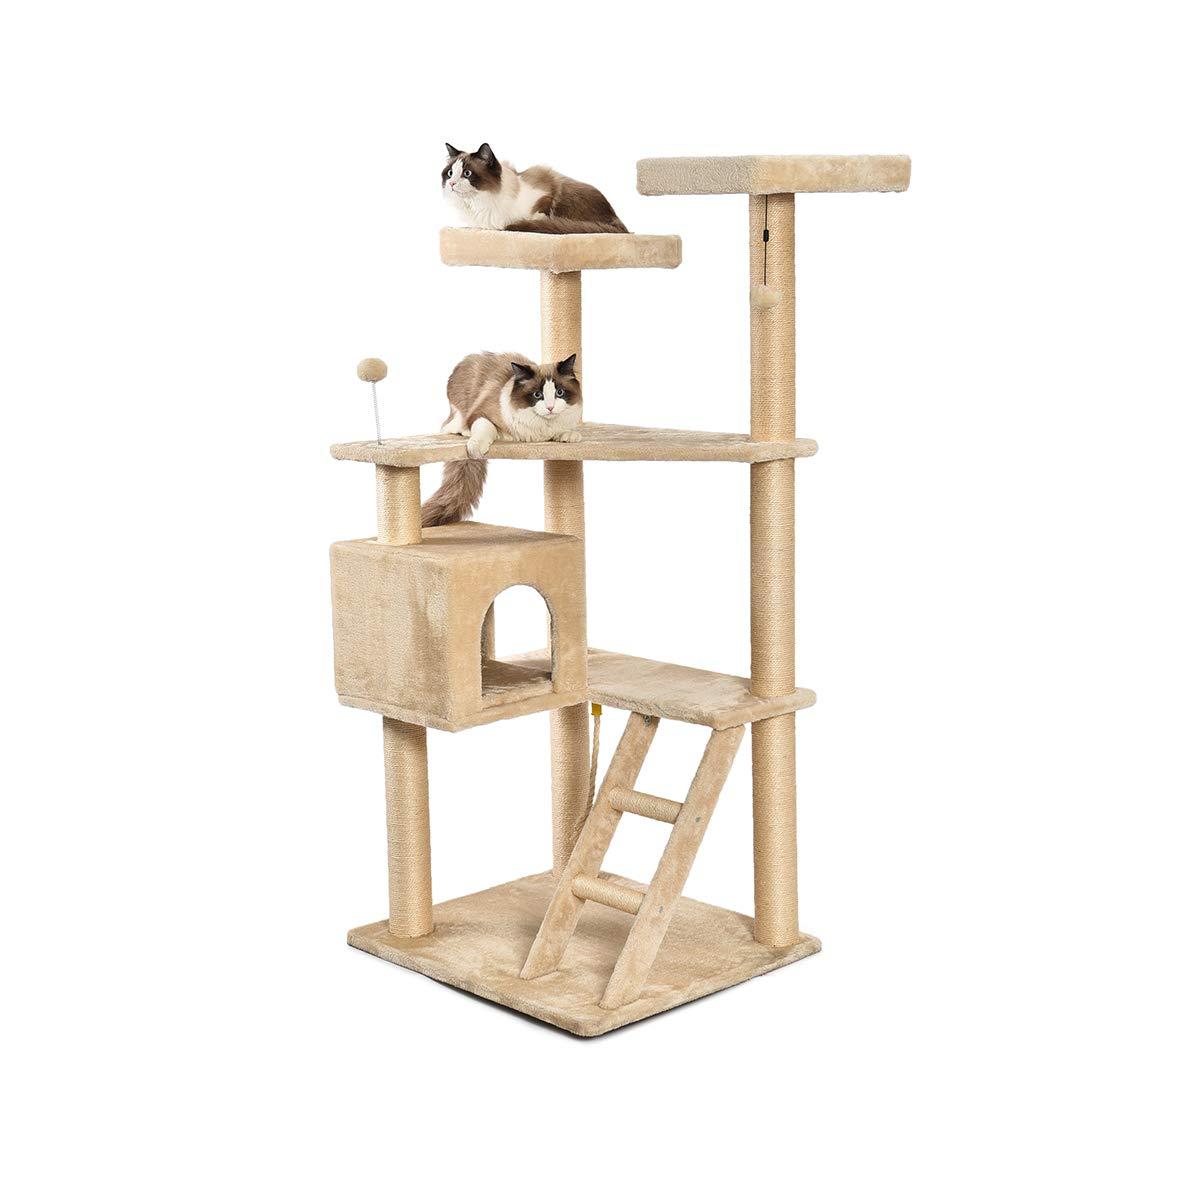 AmazonBasics Extra Large Multi-Level Cat Tree with Condo And Step Ladder - 31.5 x 70.5 x 29 Inches, Beige by AmazonBasics